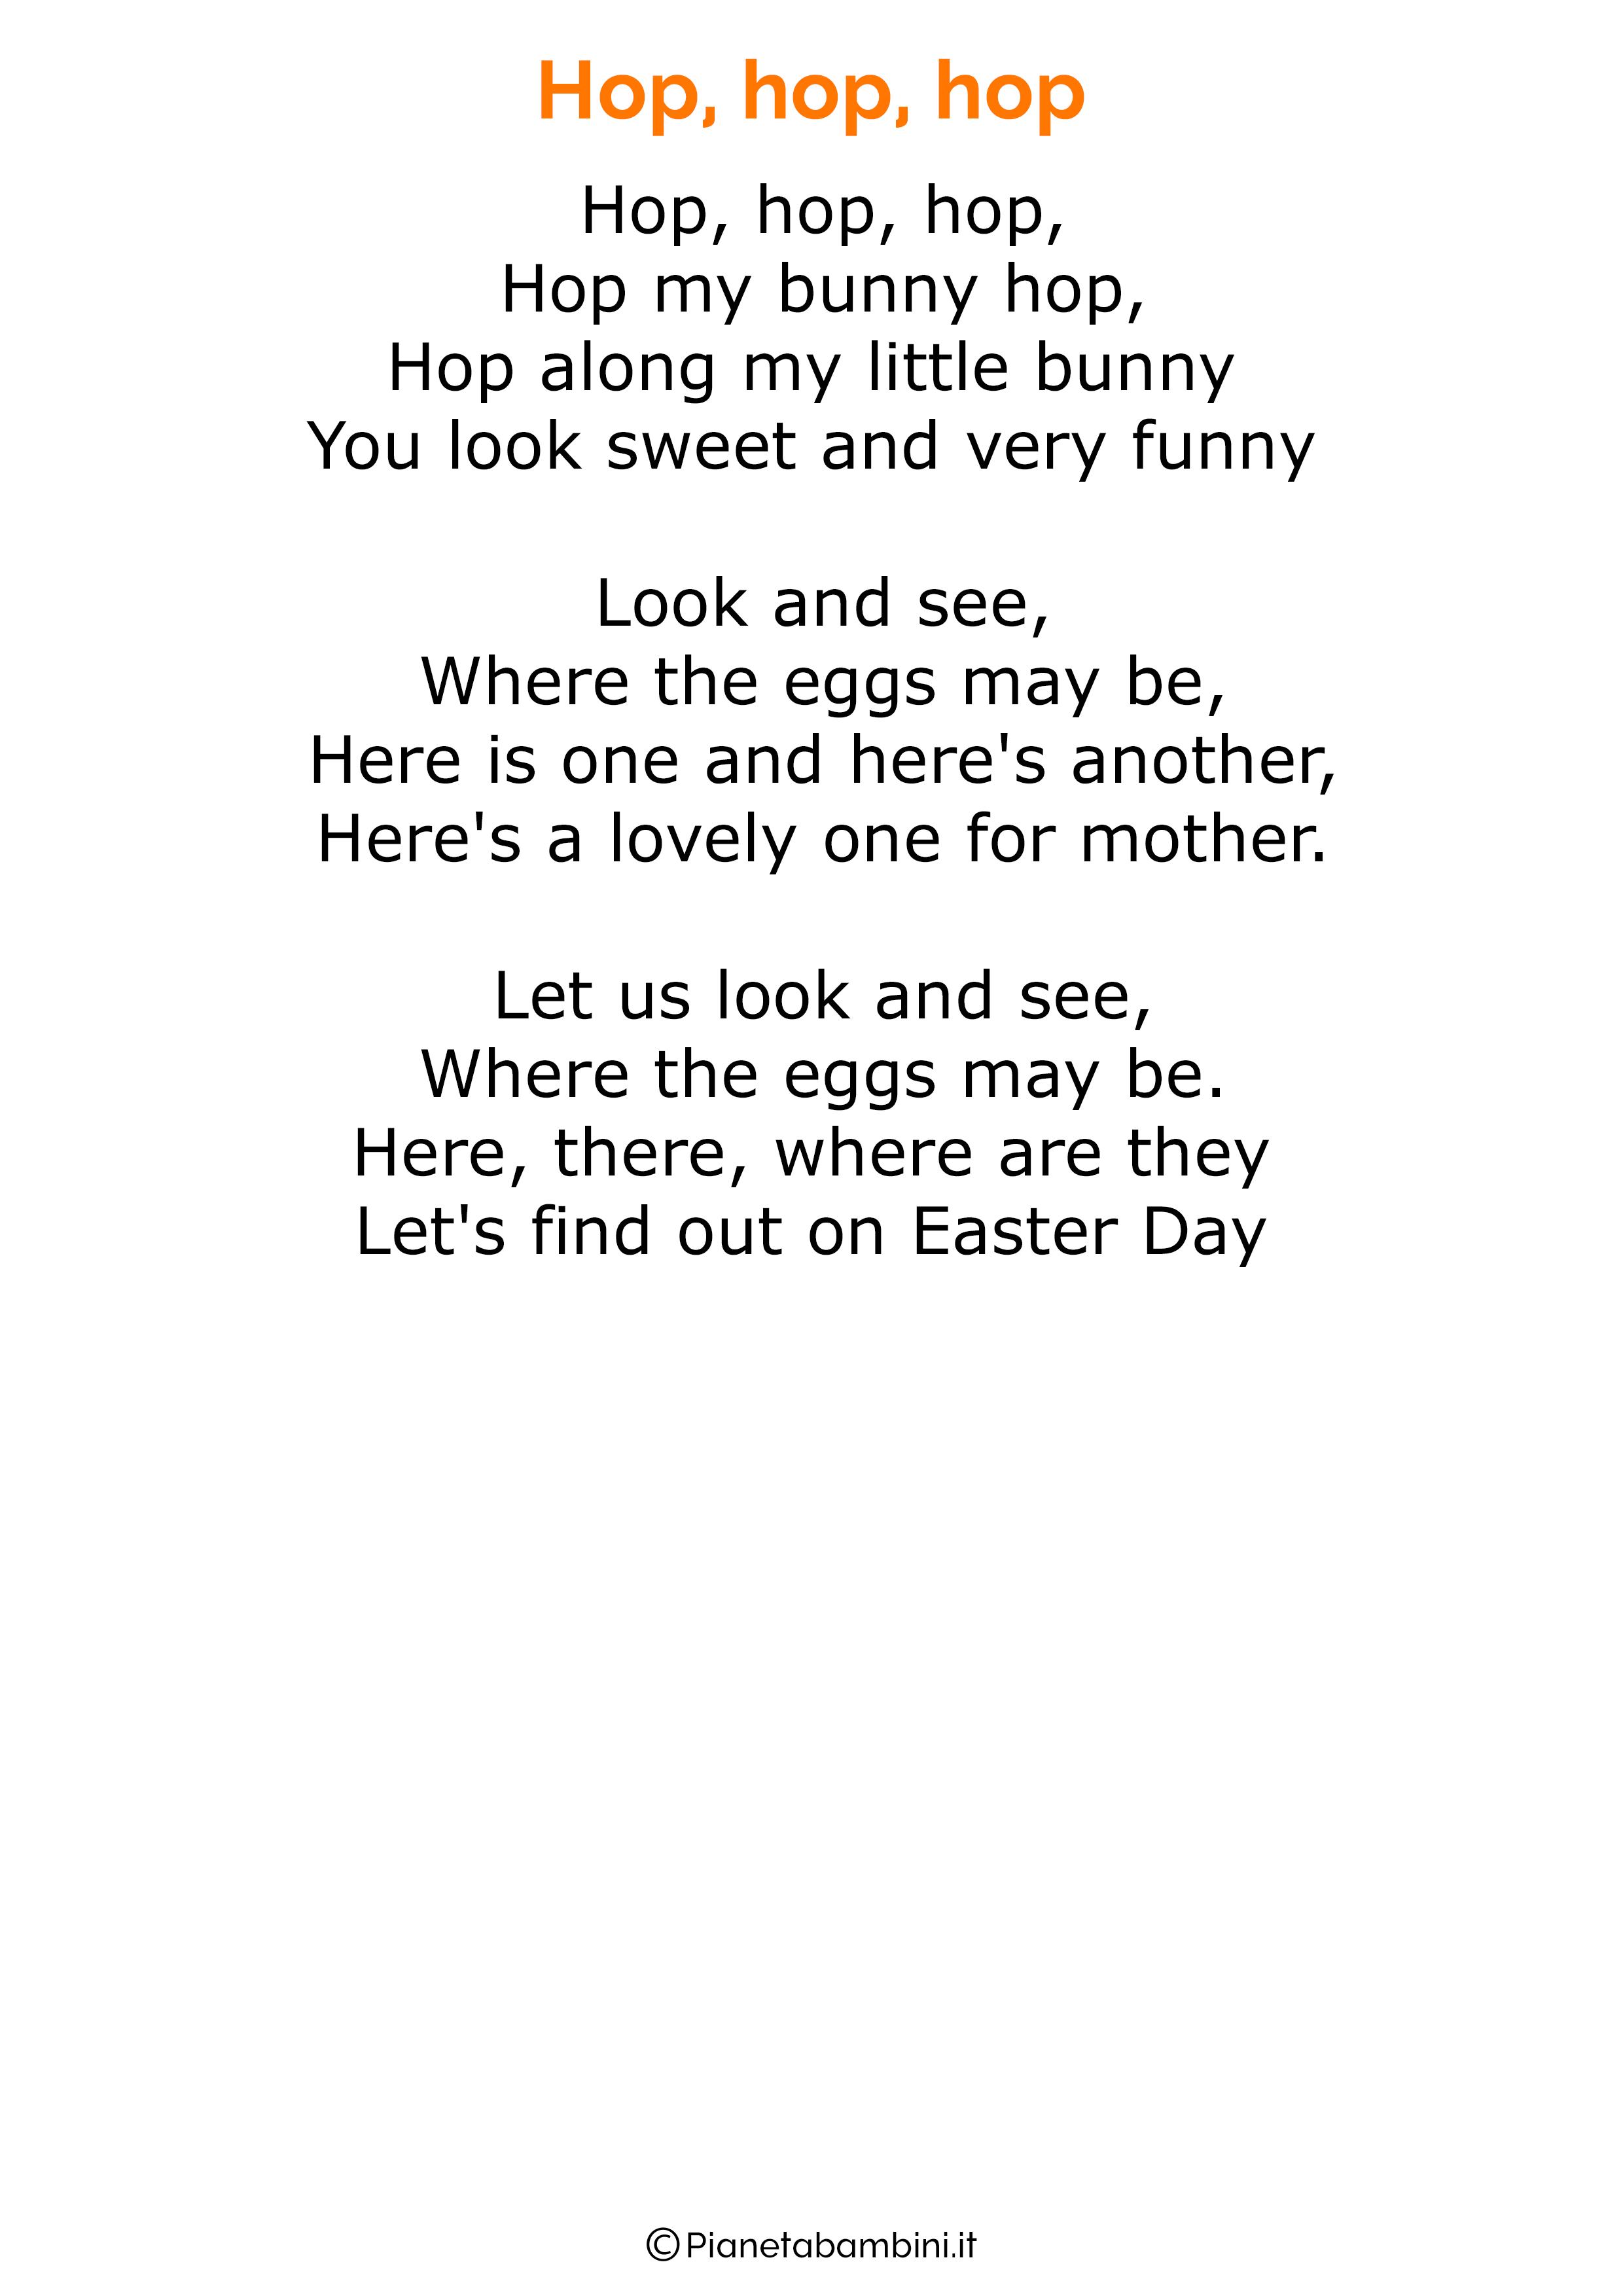 Poesie Di Natale In Inglese Per Bambini.30 Poesie Di Pasqua In Inglese Per Bambini Inglese Poesia Canzoni Per Bambini